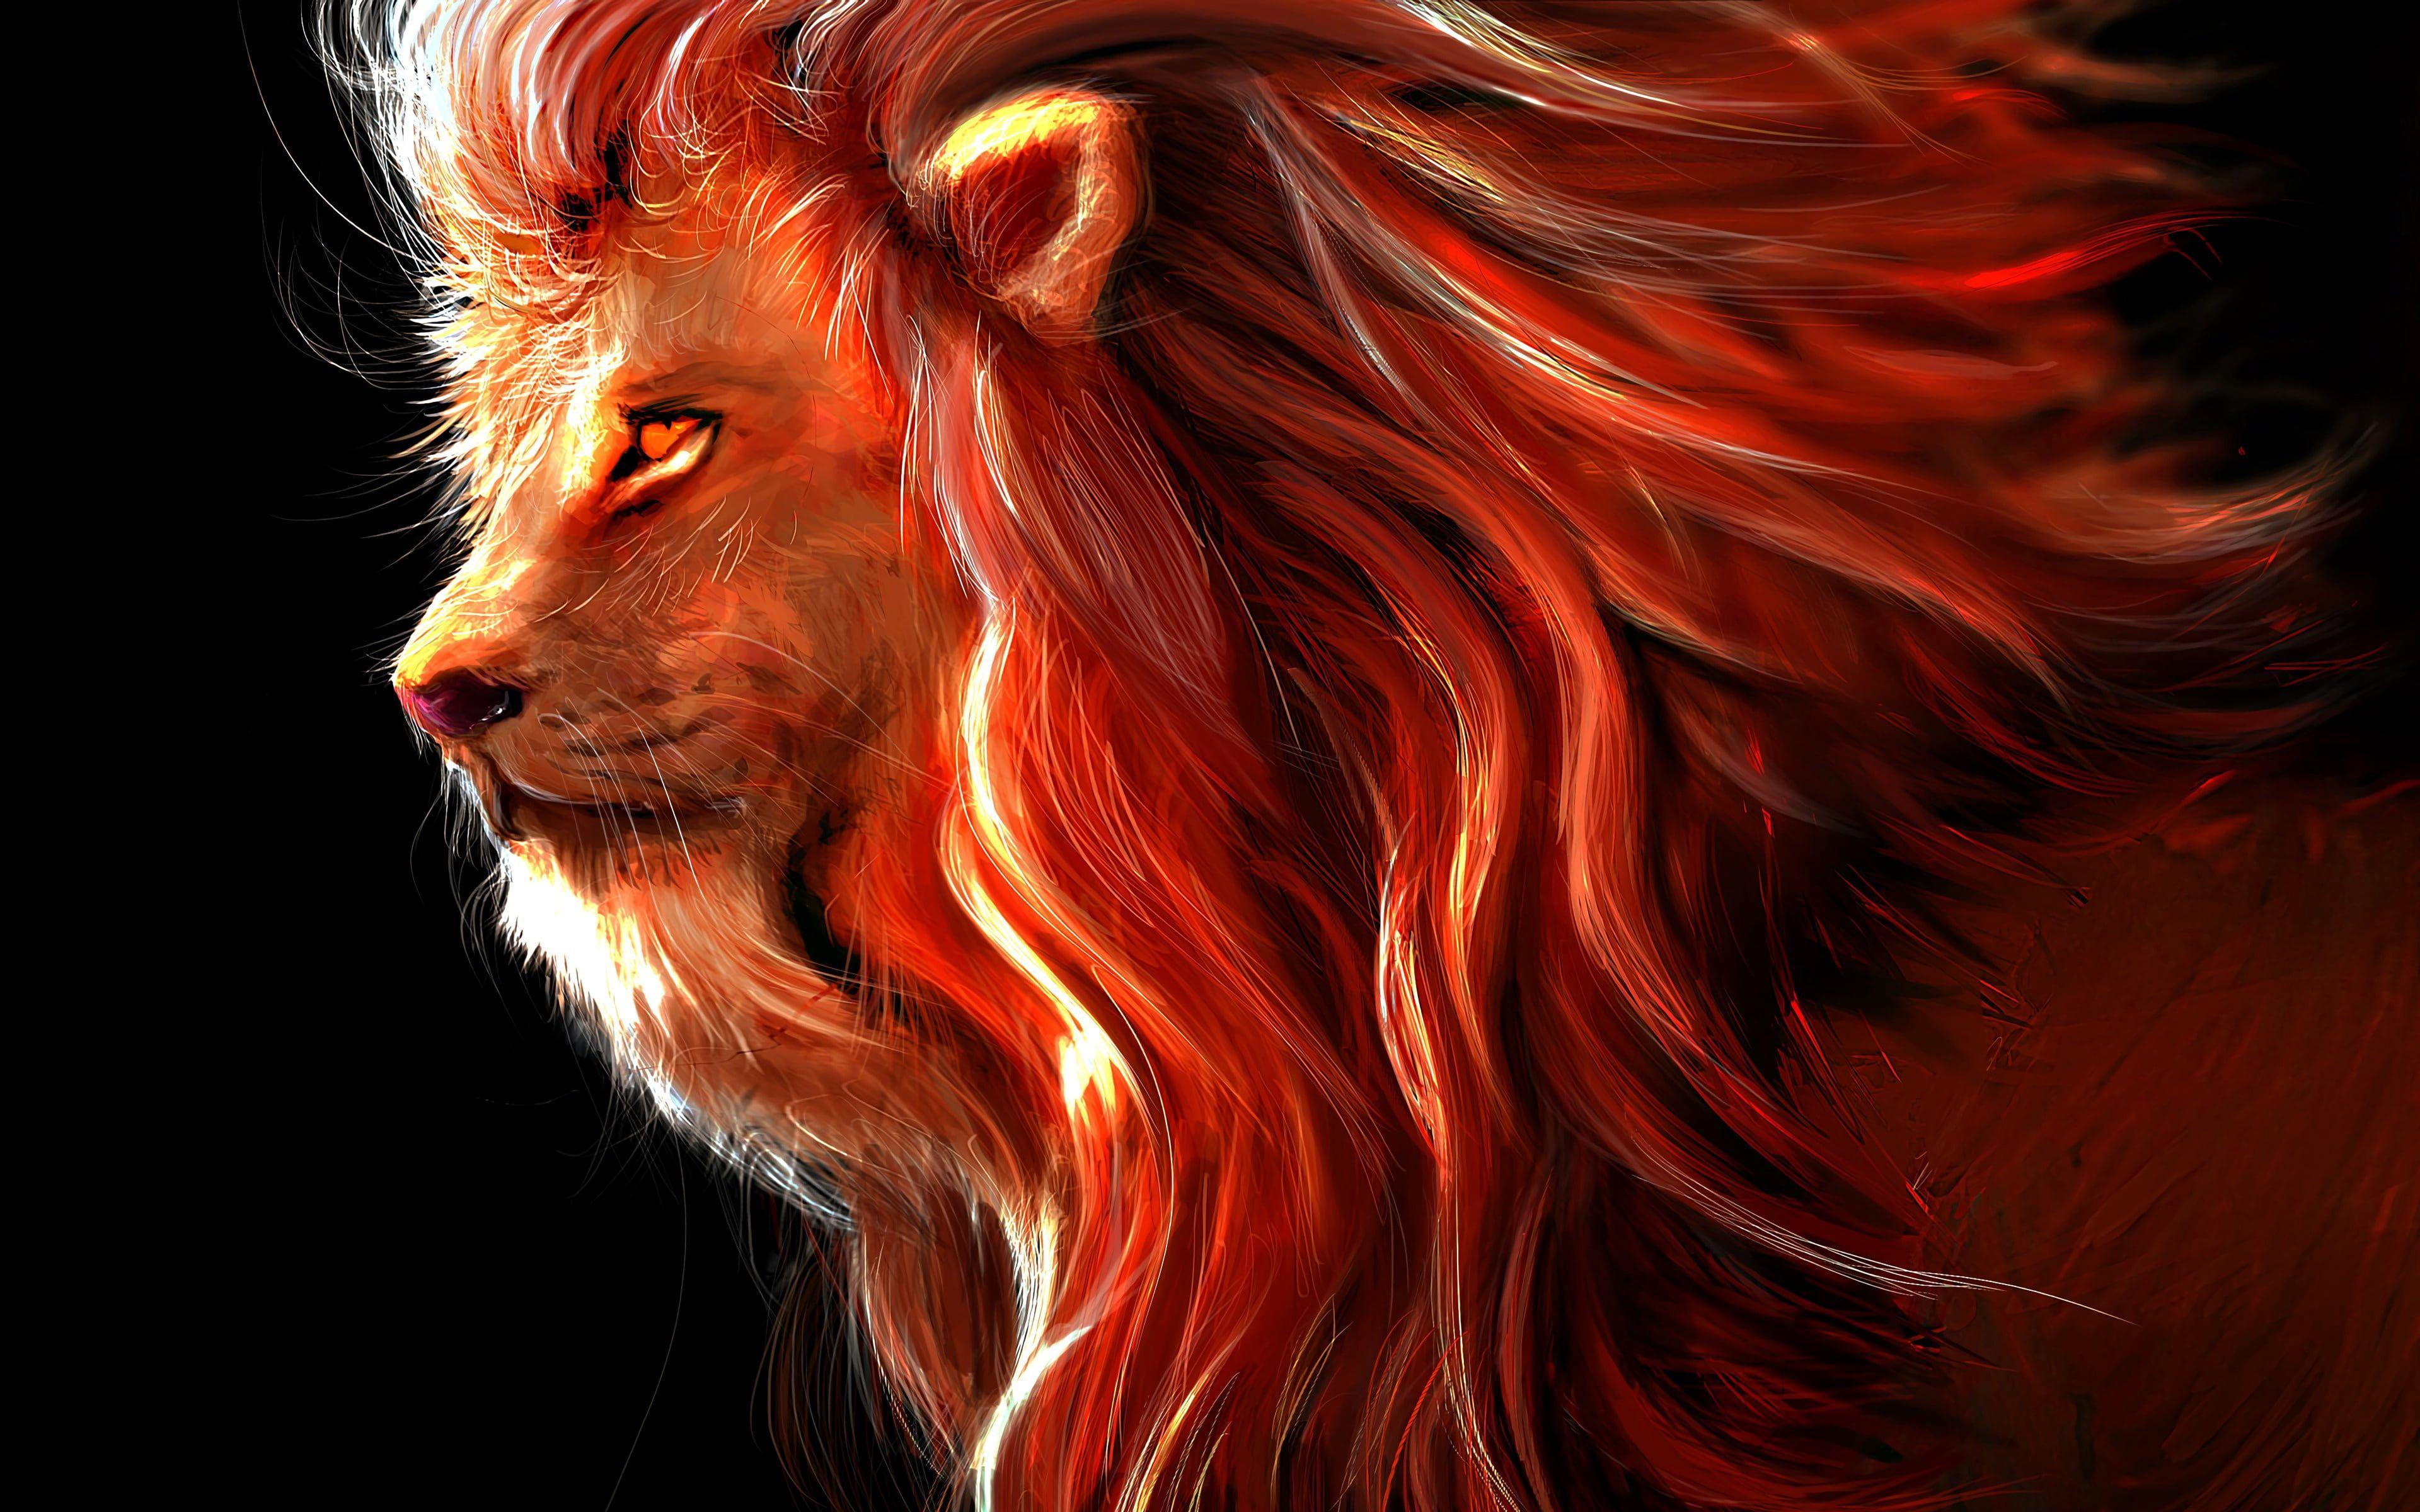 Art Lion Predator Painting Rendering Digital Art Big Cat King Of Beasts 4k Ultra Hd Background 4k Wallpaper Hdwa In 2020 Lion Artwork Digital Art Lion Painting